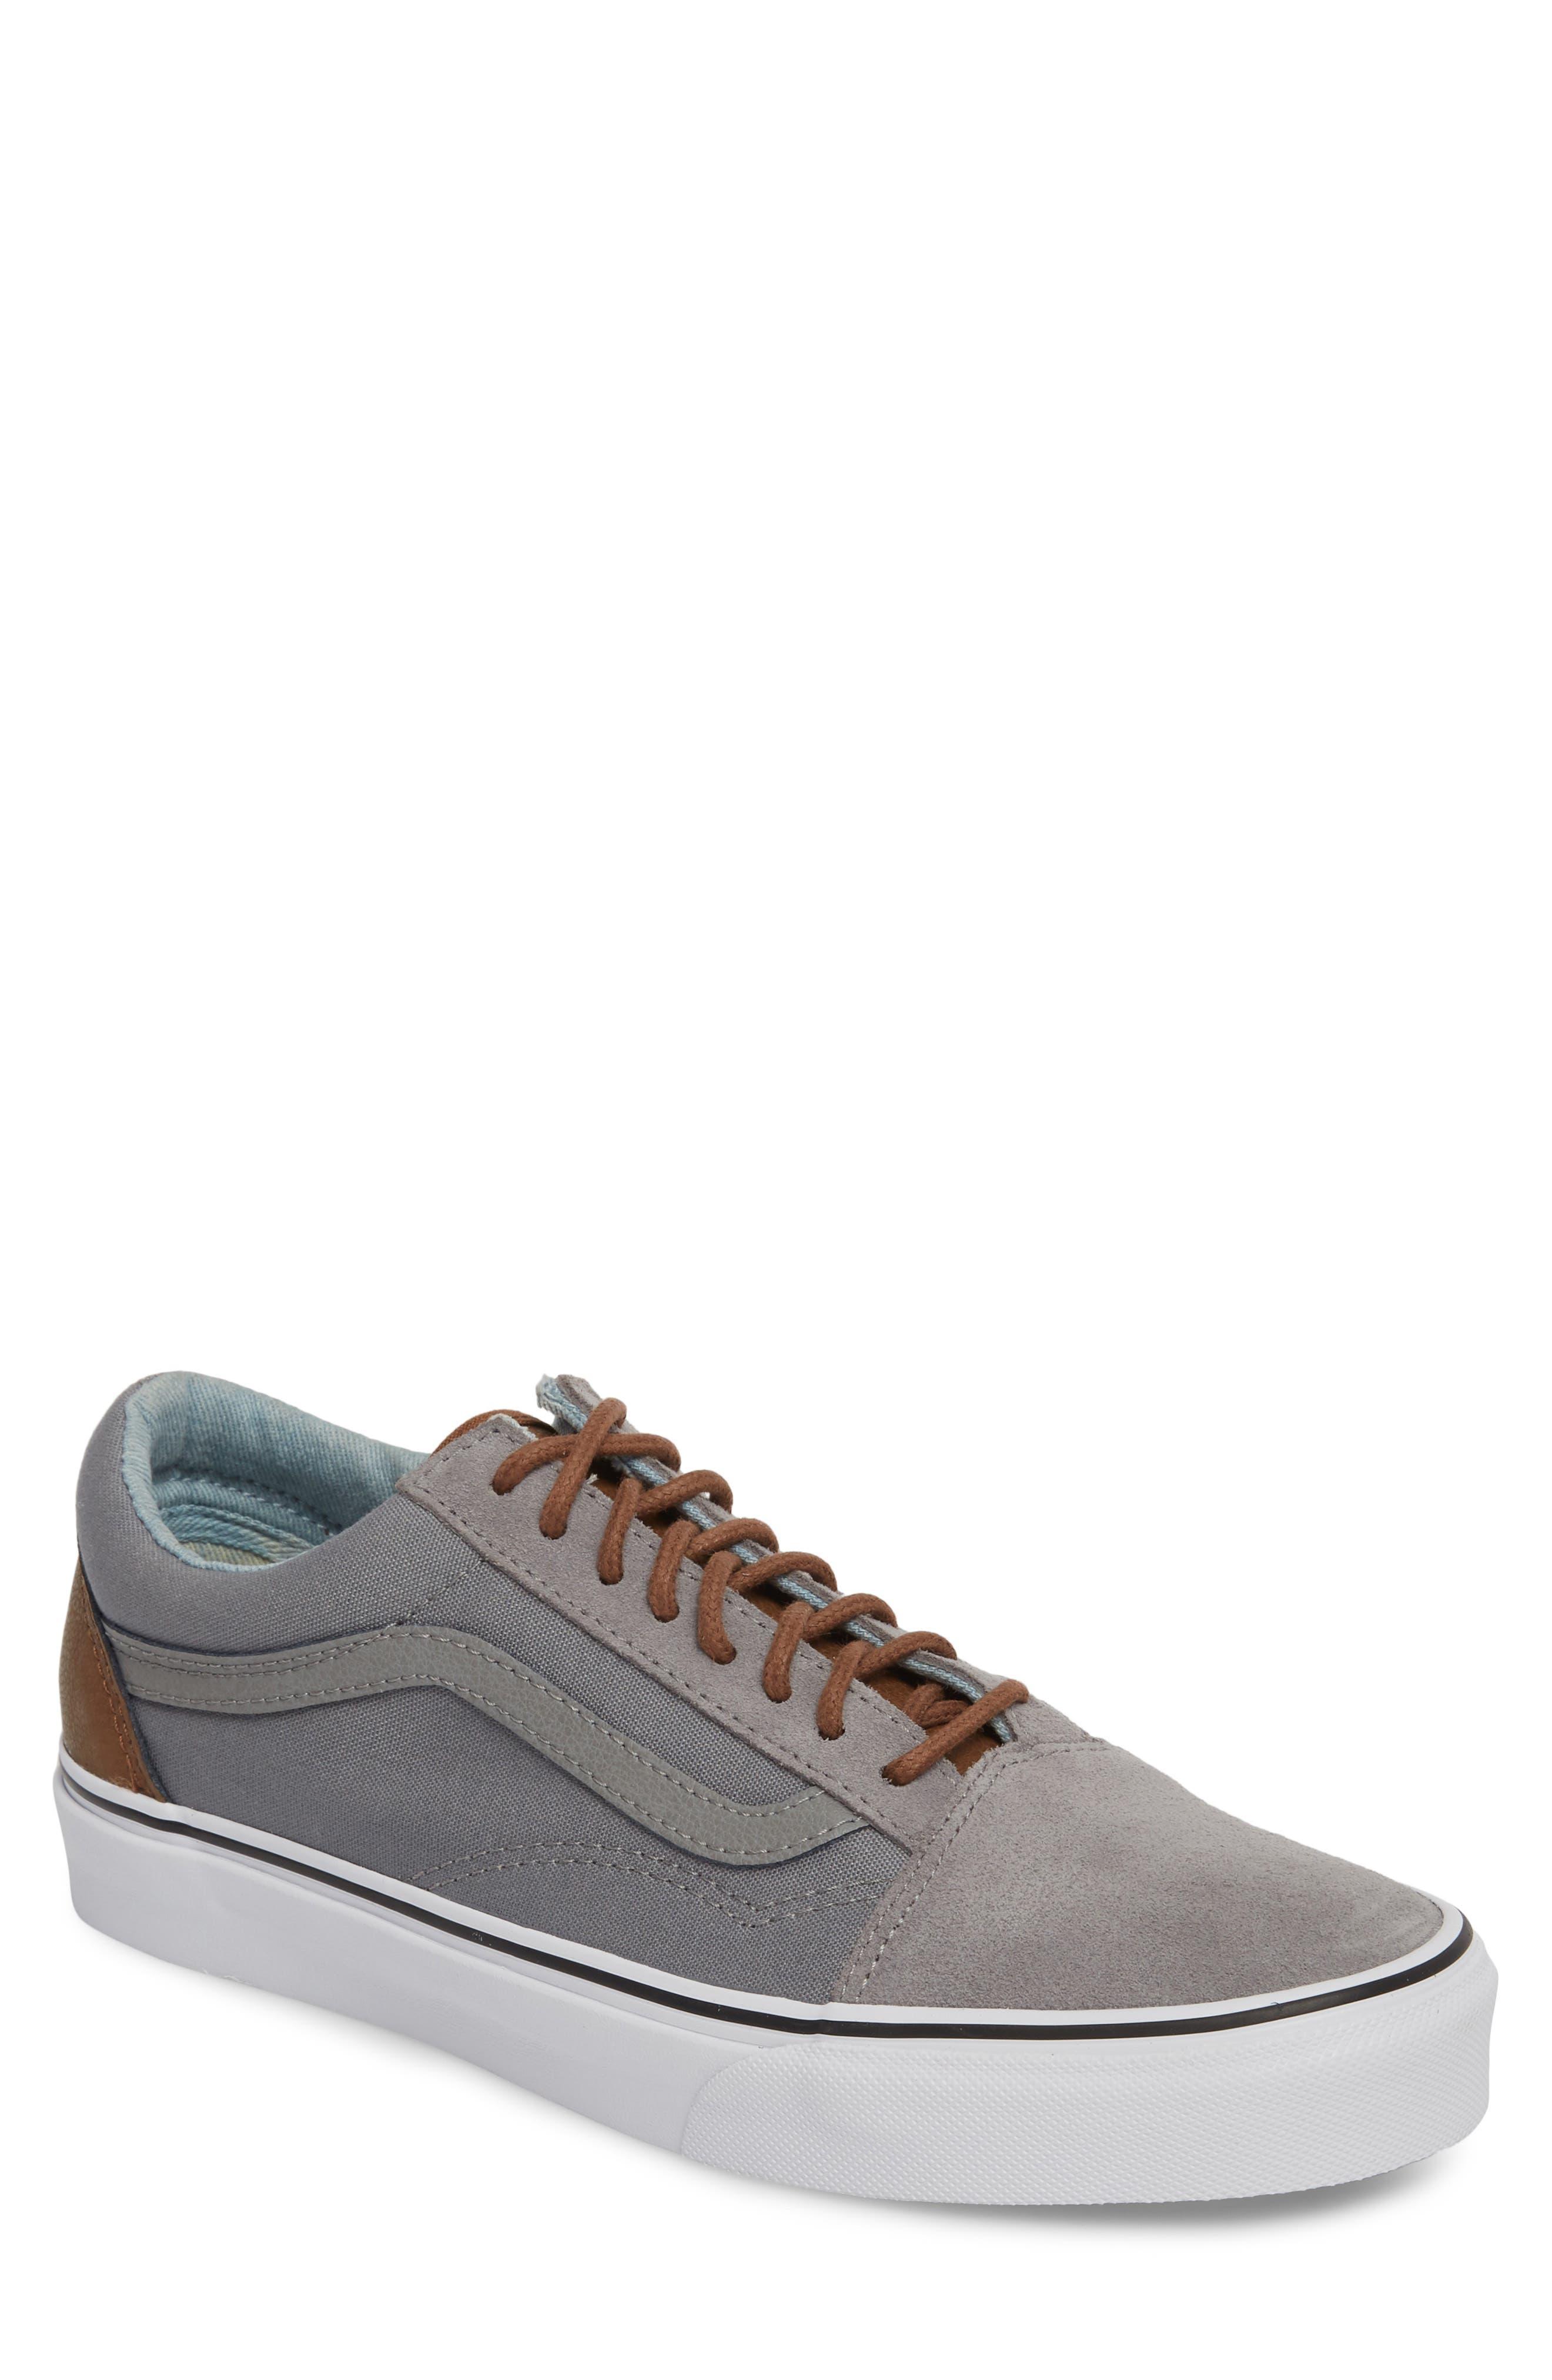 Old Skool Low Top Sneaker,                             Main thumbnail 1, color,                             Frost Grey/ Acid Denim Leather